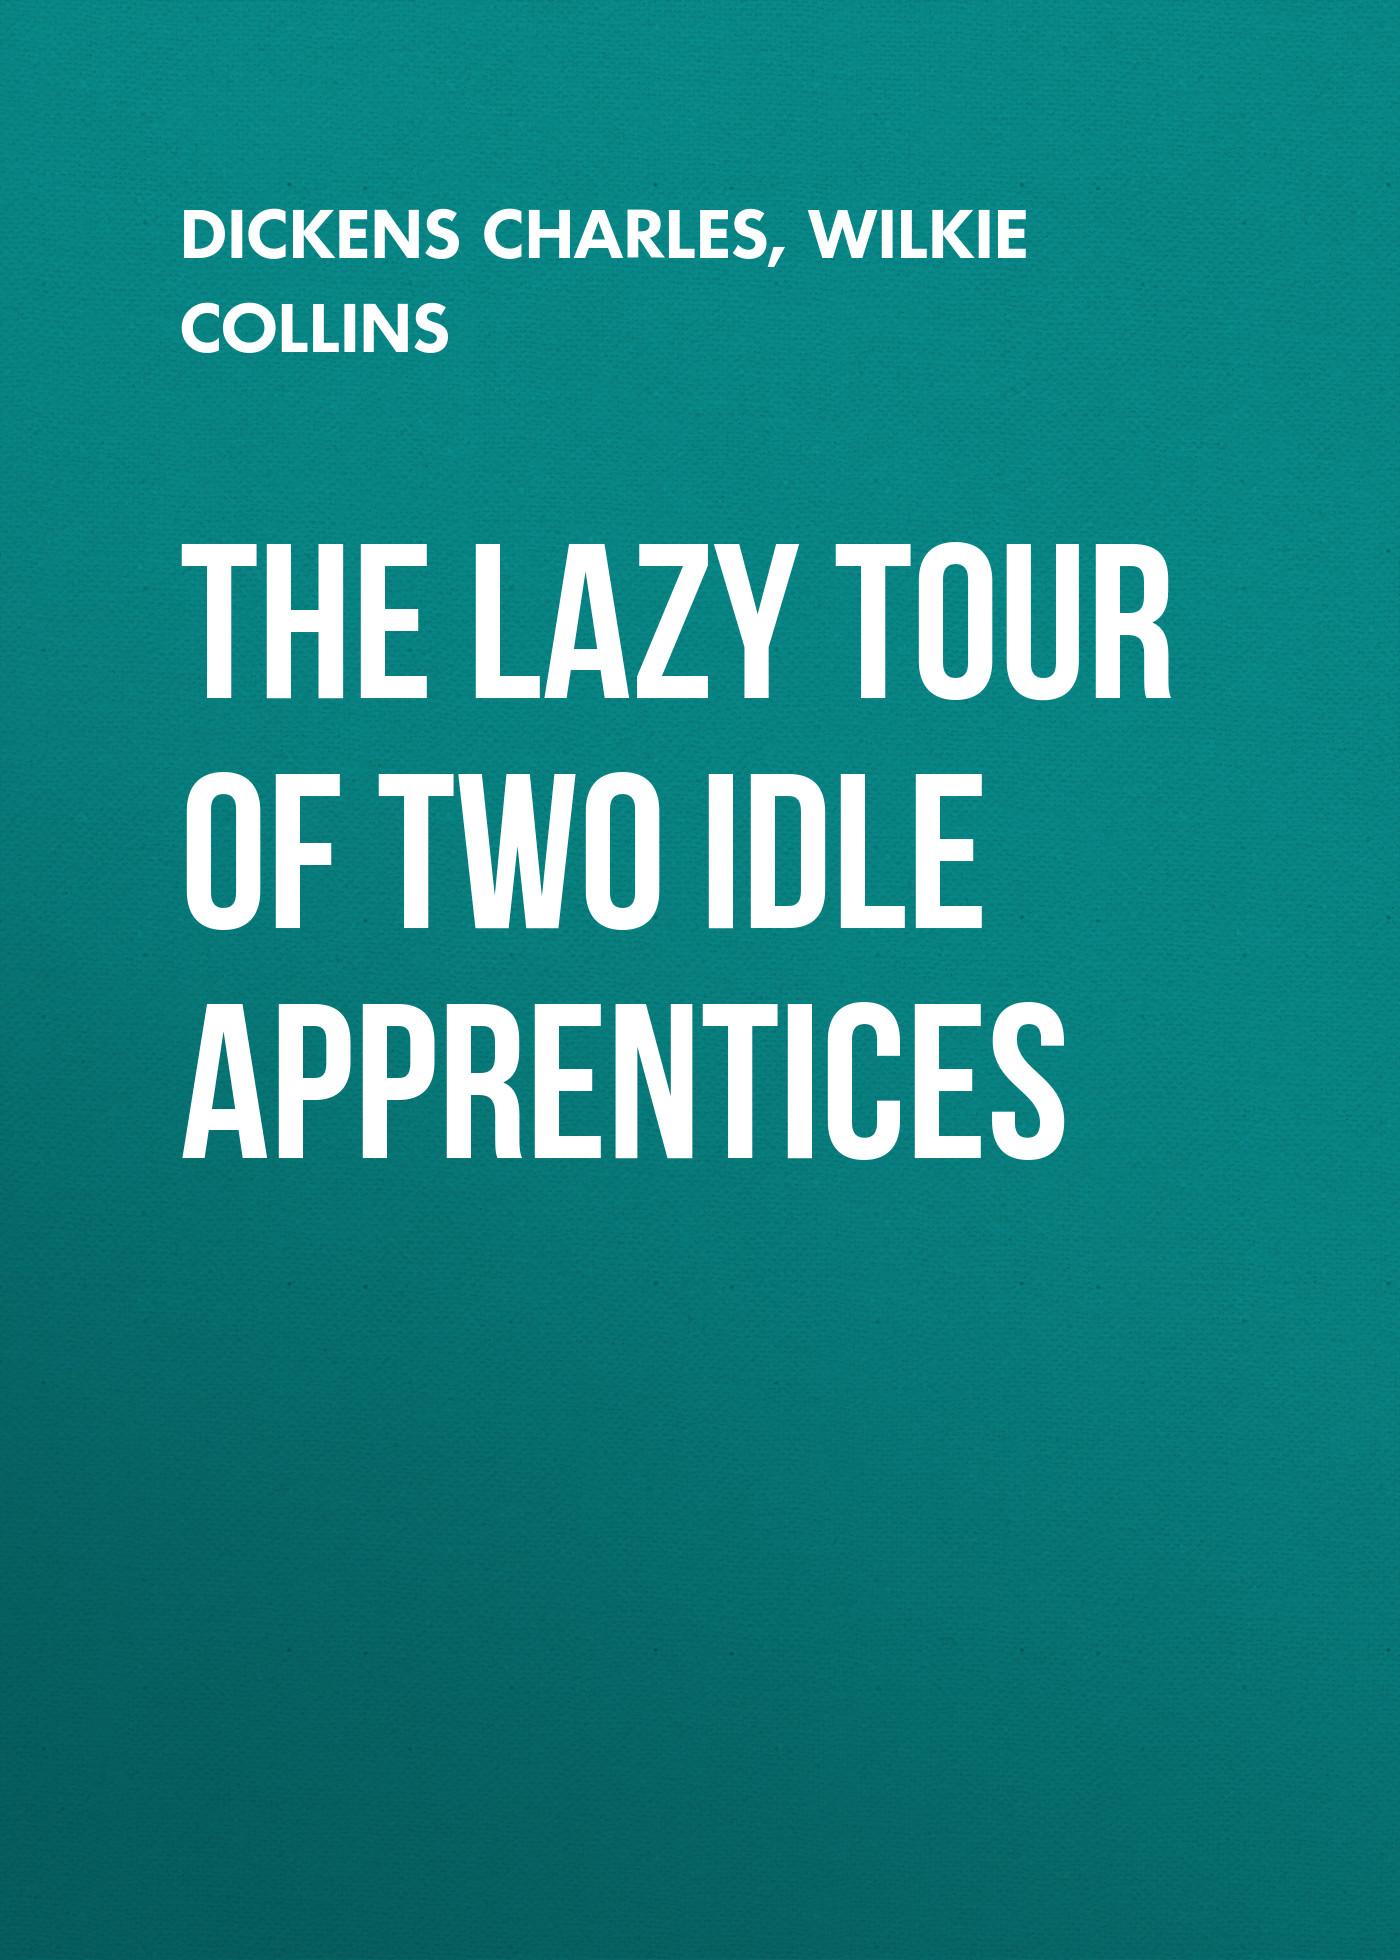 Чарльз Диккенс The Lazy Tour of Two Idle Apprentices чарльз диккенс the lazy tour of two idle apprentices